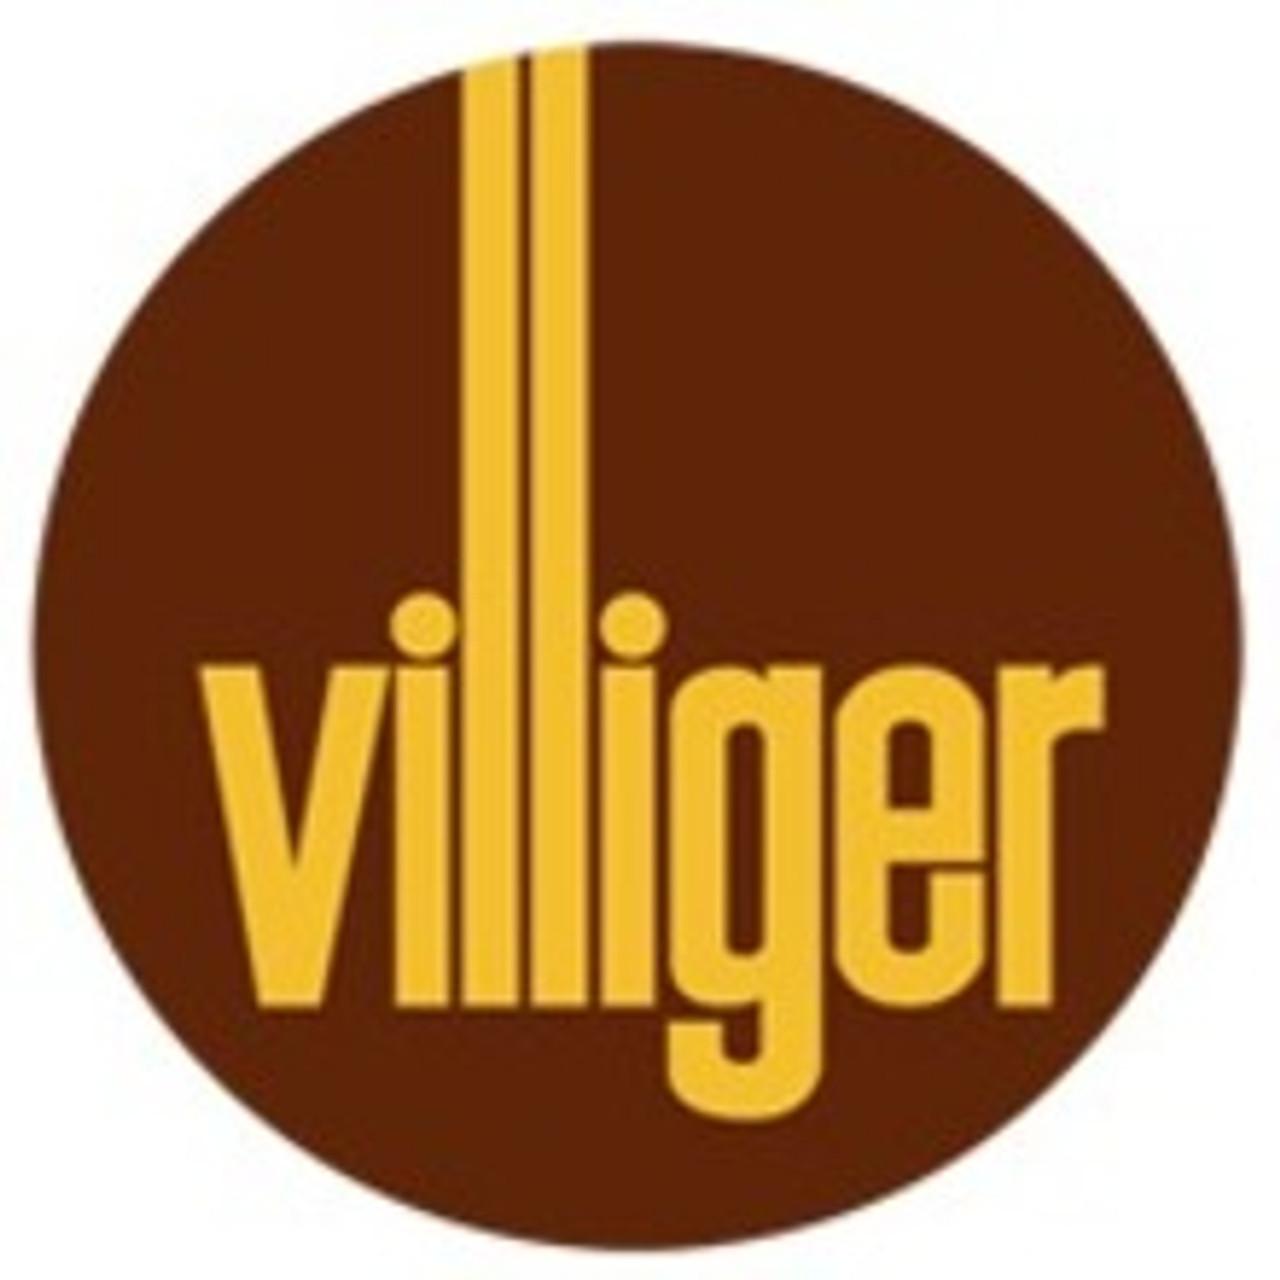 Villiger Braniff #2 Cigars (Box of 50) - Natural